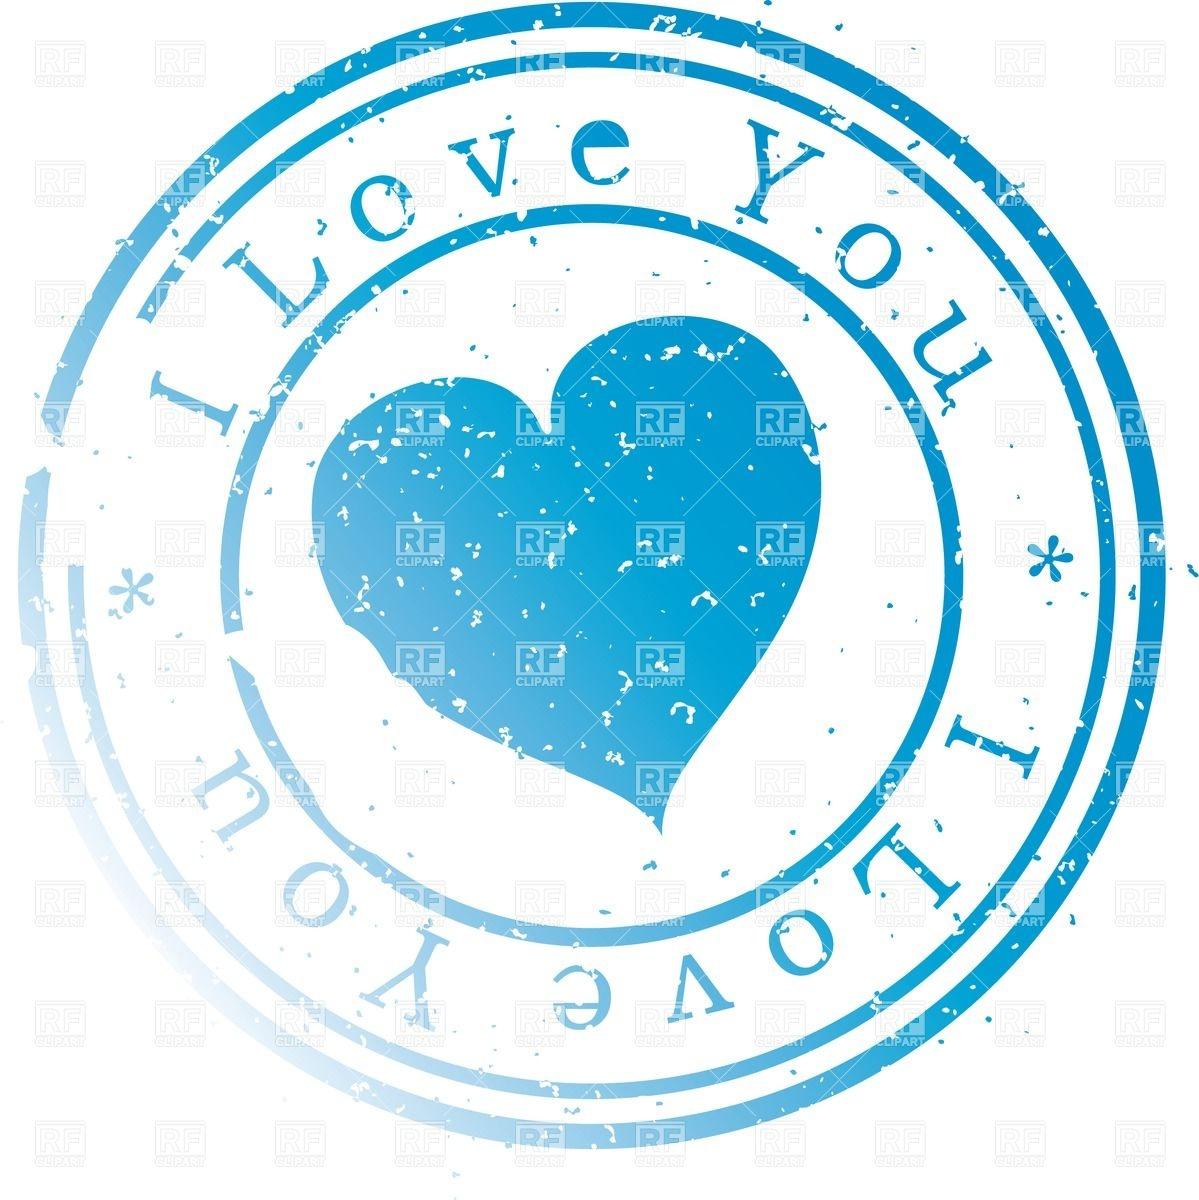 1199x1200 Stamp I Love You Vector Image Vector Artwork Of Design Elements